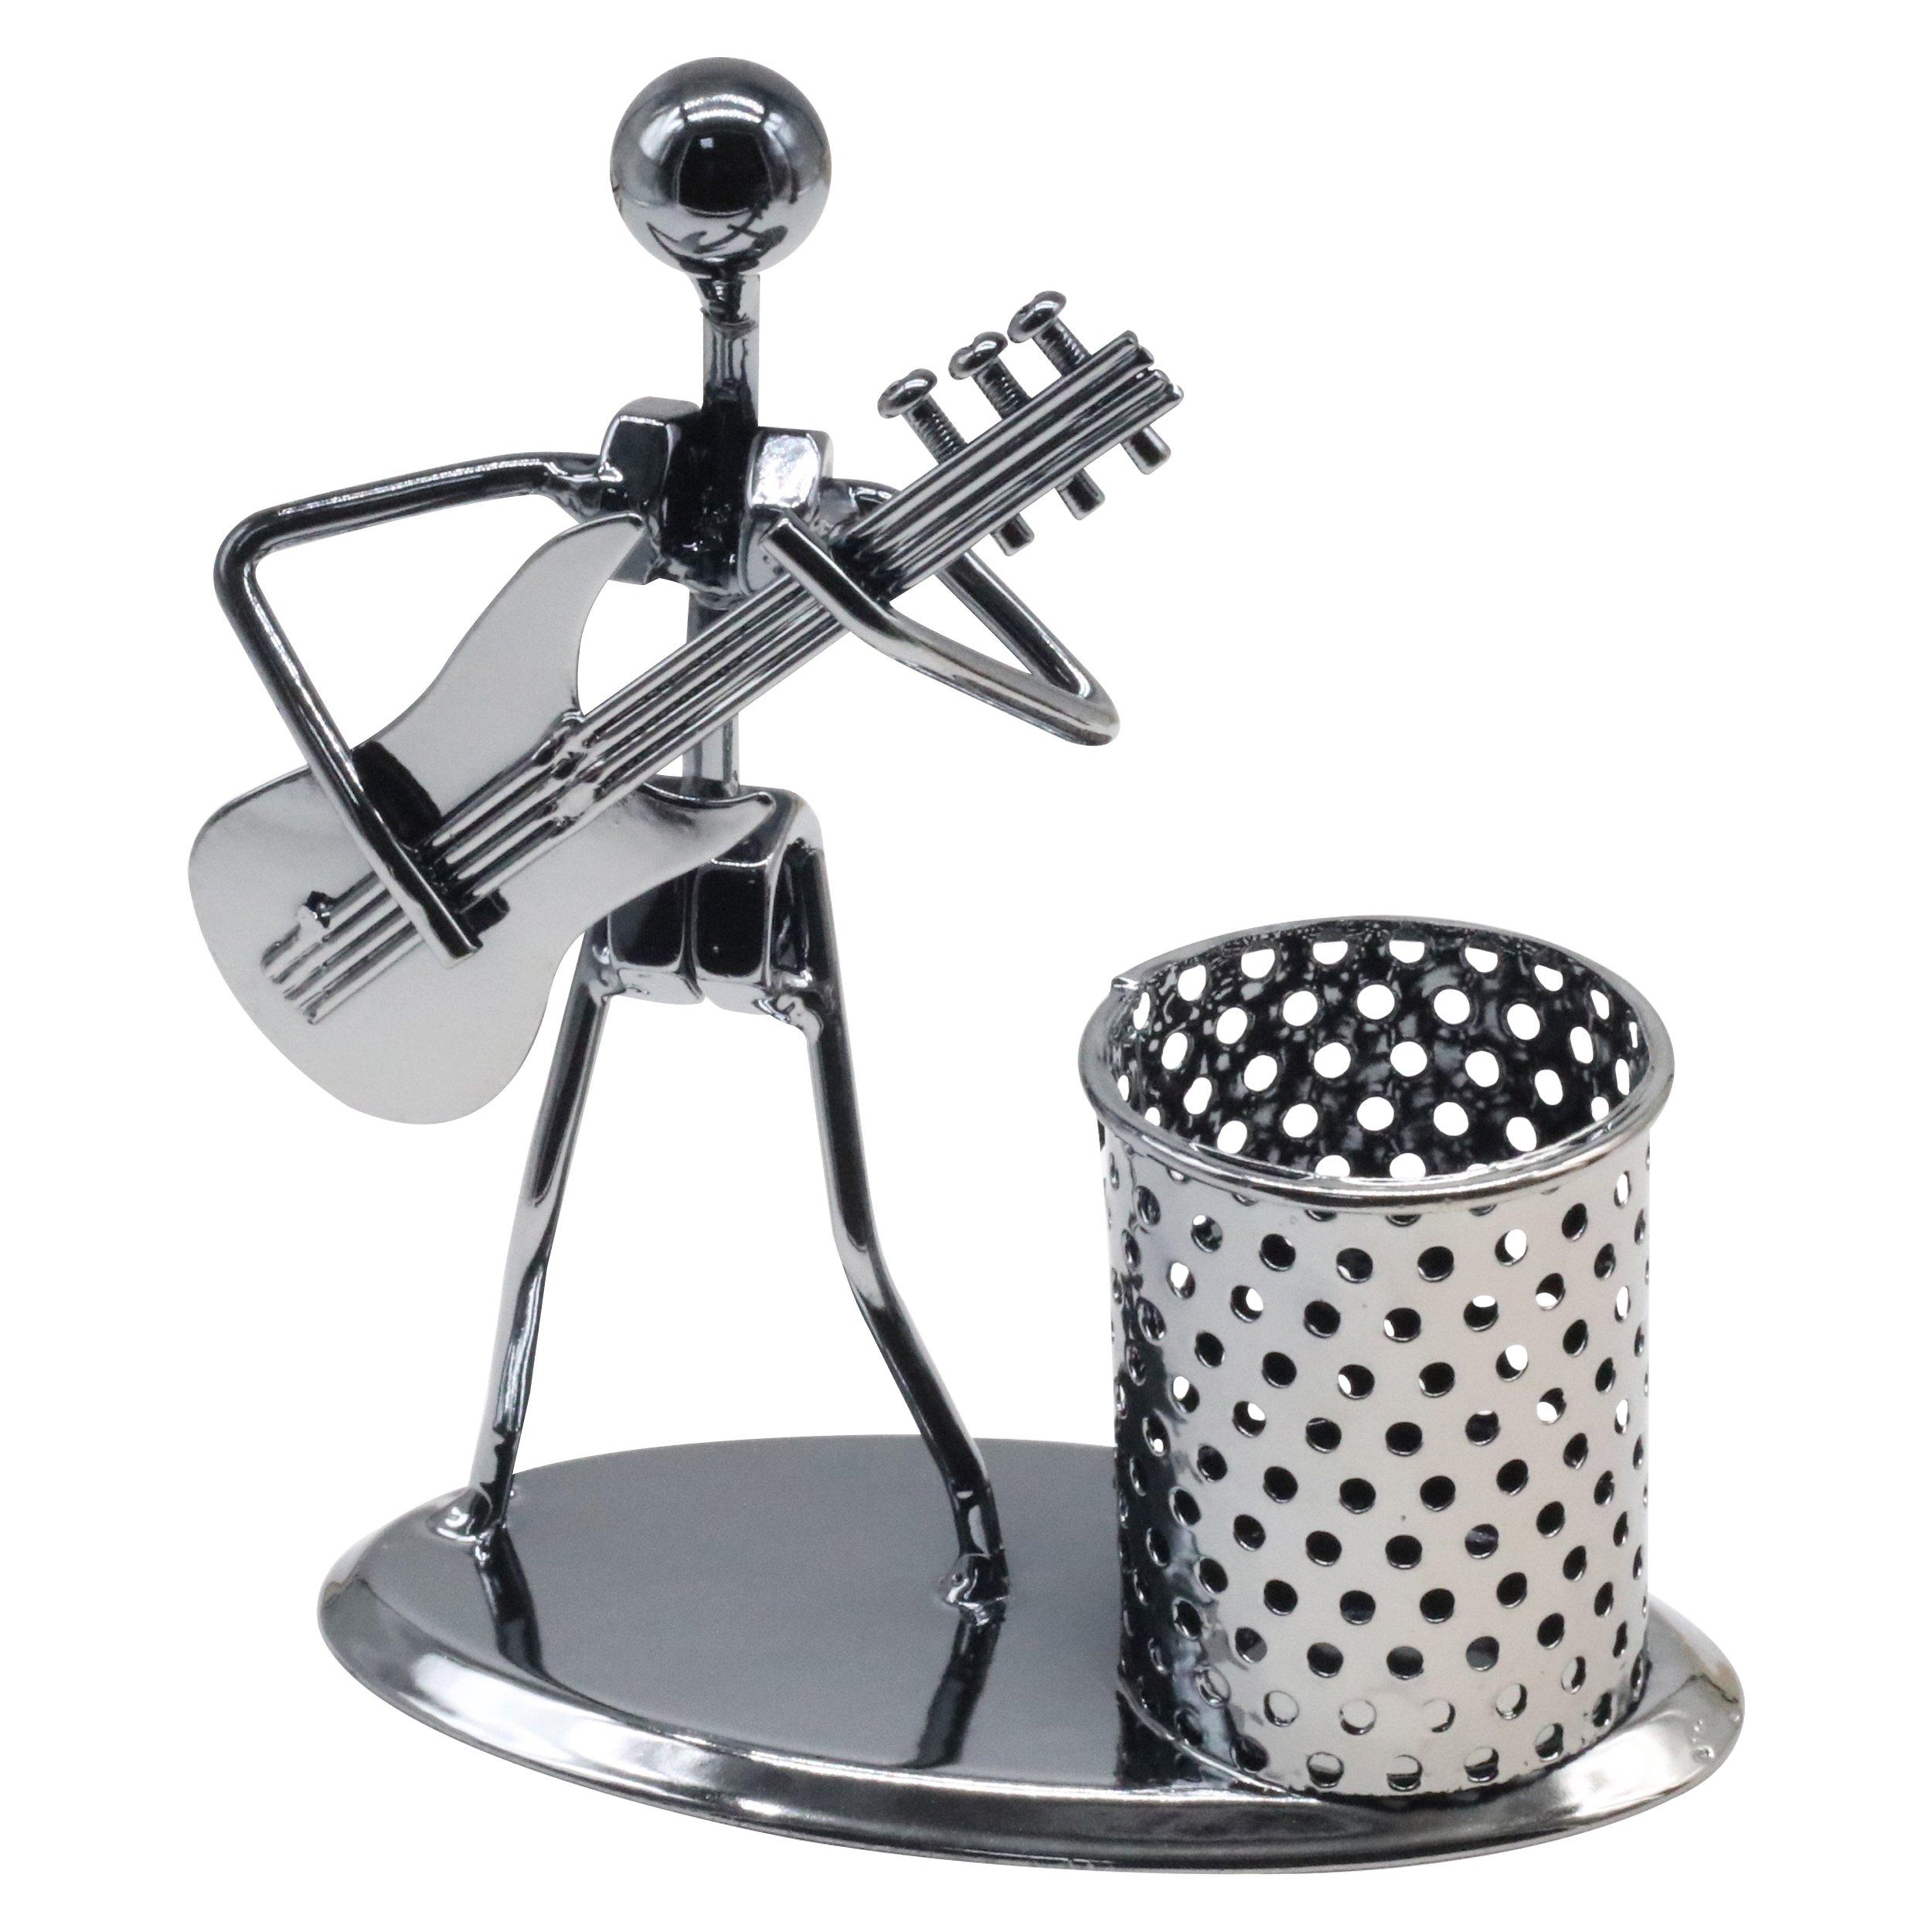 Creative Office Desktop Accessories Musical Stainless Steel Pen Pencil Holder Children Toy Gifts (Guitar)